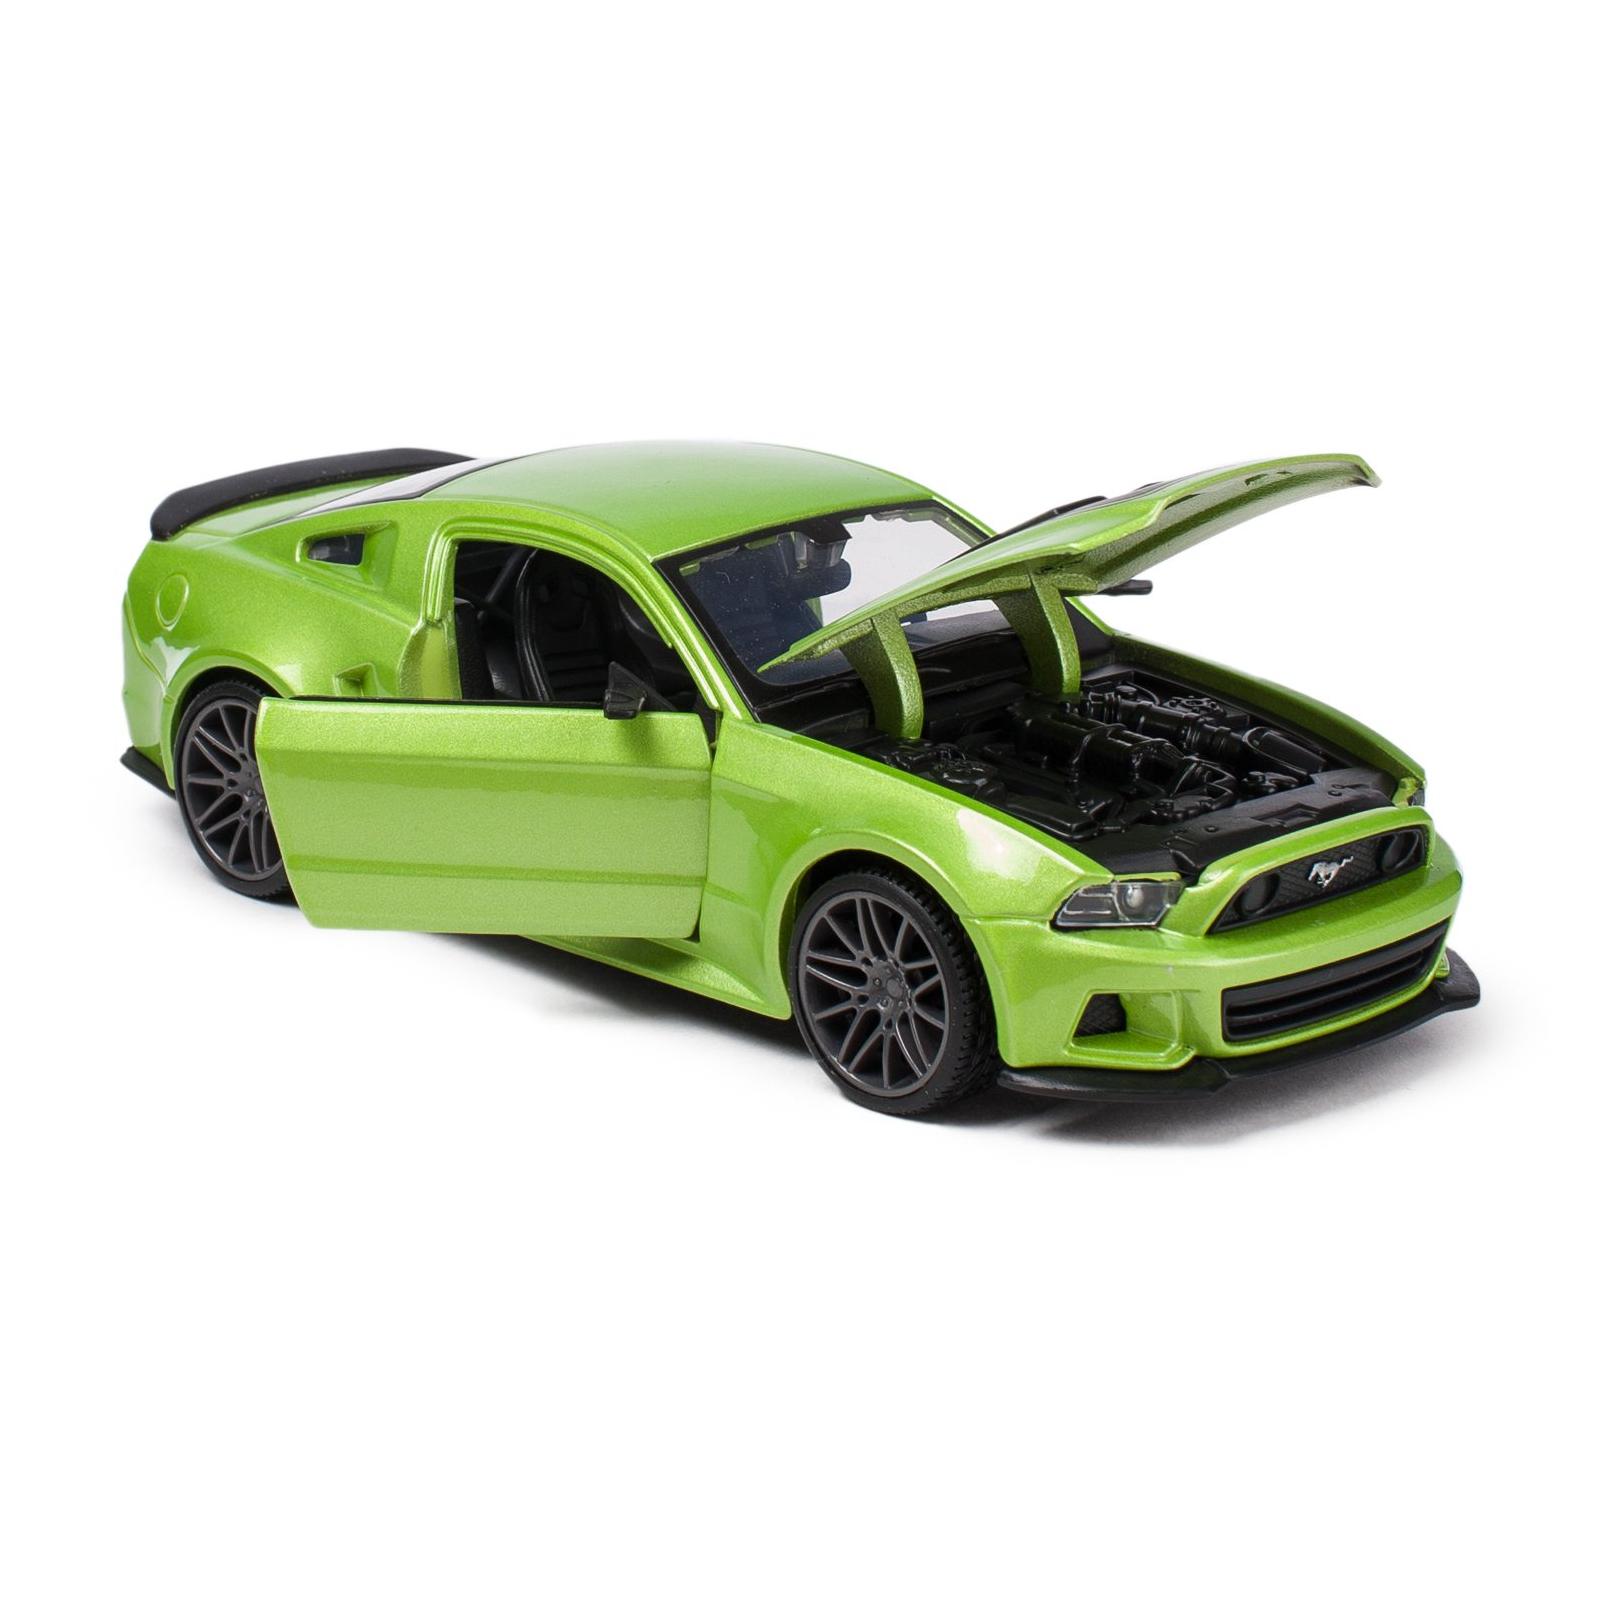 Машина Maisto Ford Mustang Street Racer 2014 (1:24) зеленый металлик (31506 met. green) изображение 3